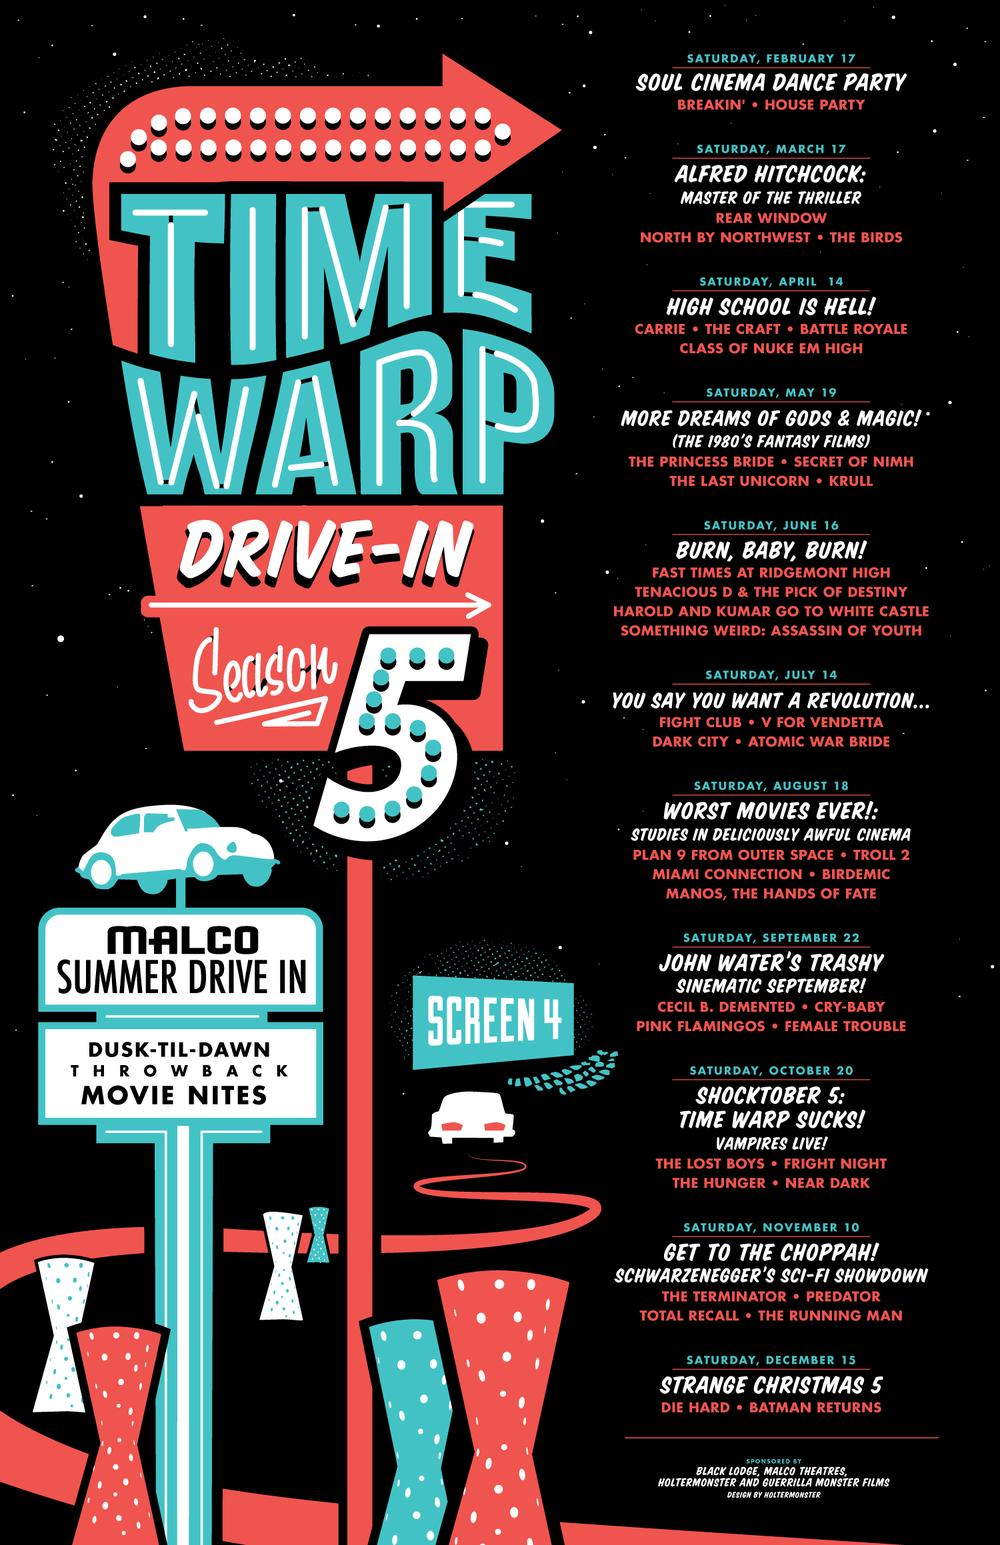 time-warp-season-5-web-poster.png